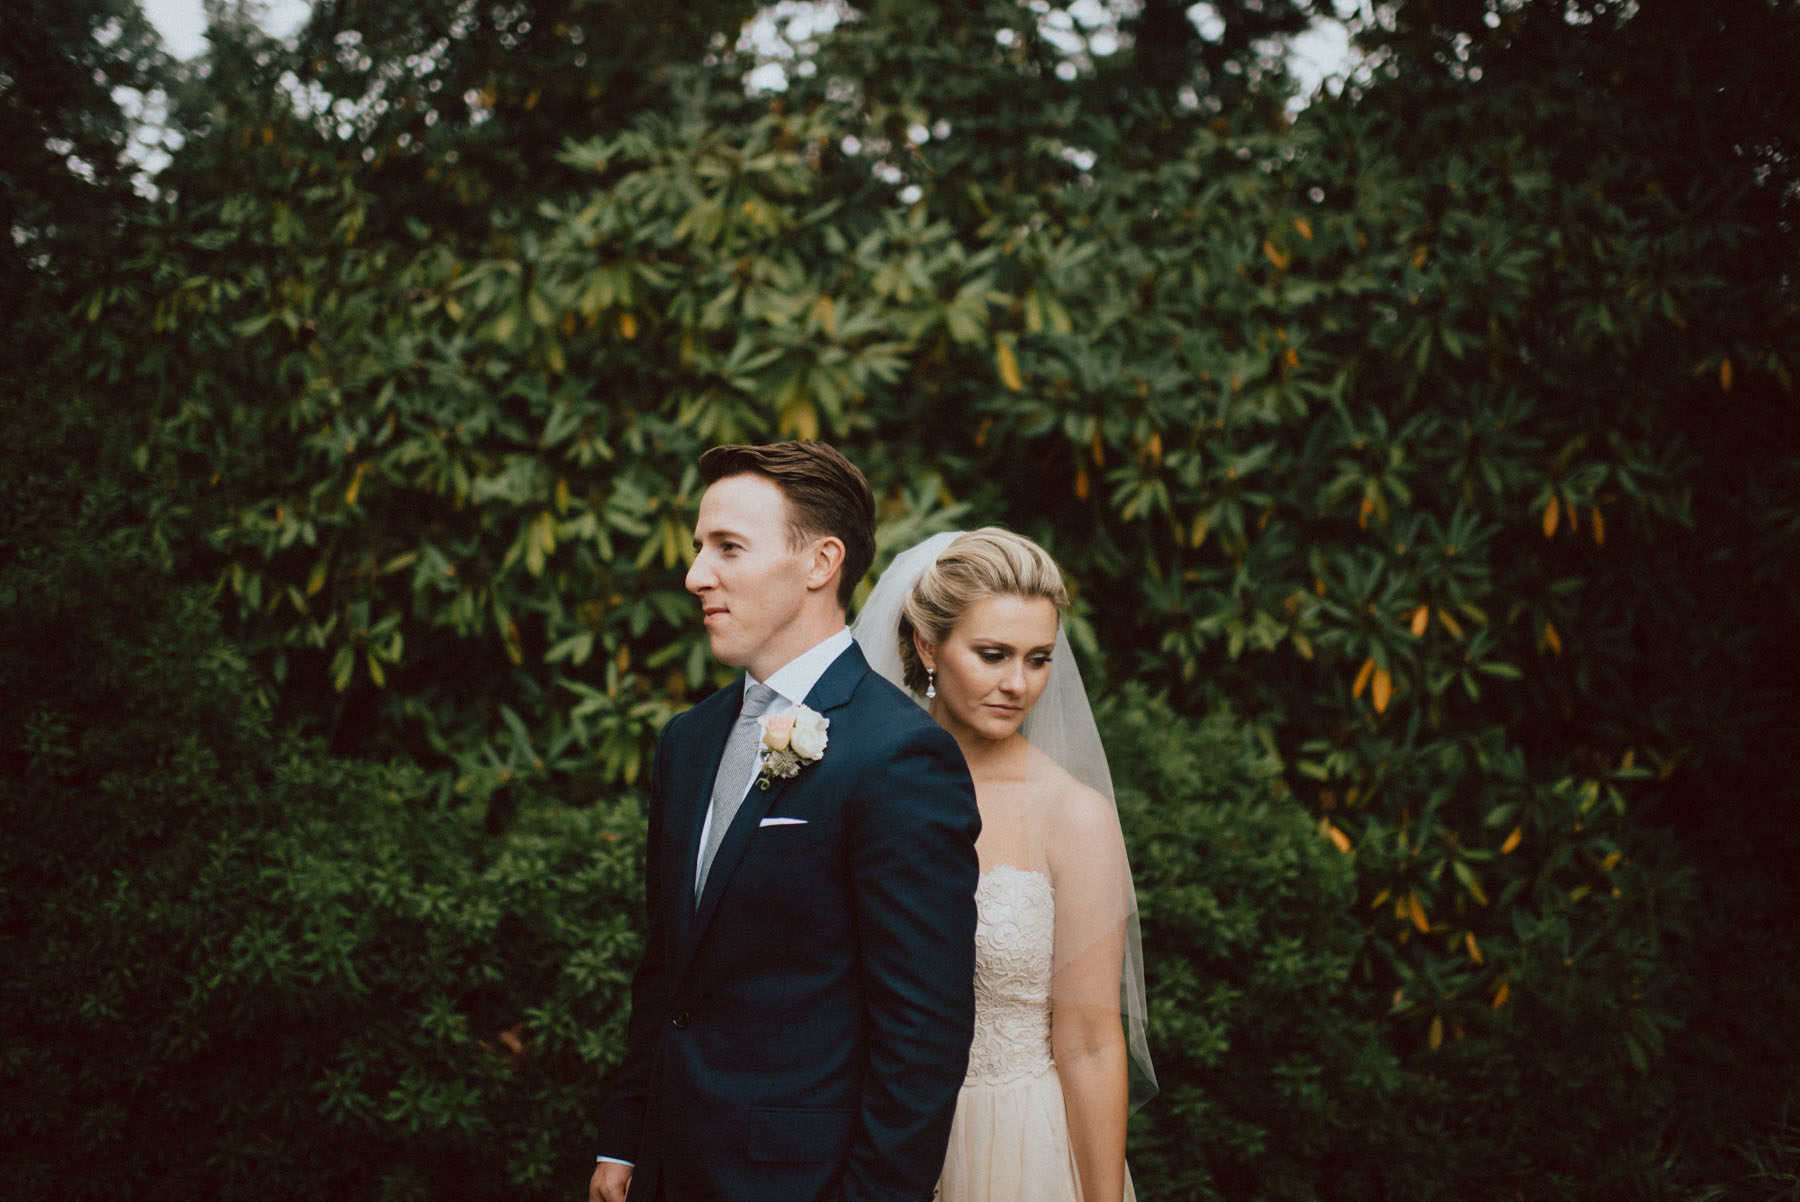 greenville-country-club-wedding-91.jpg